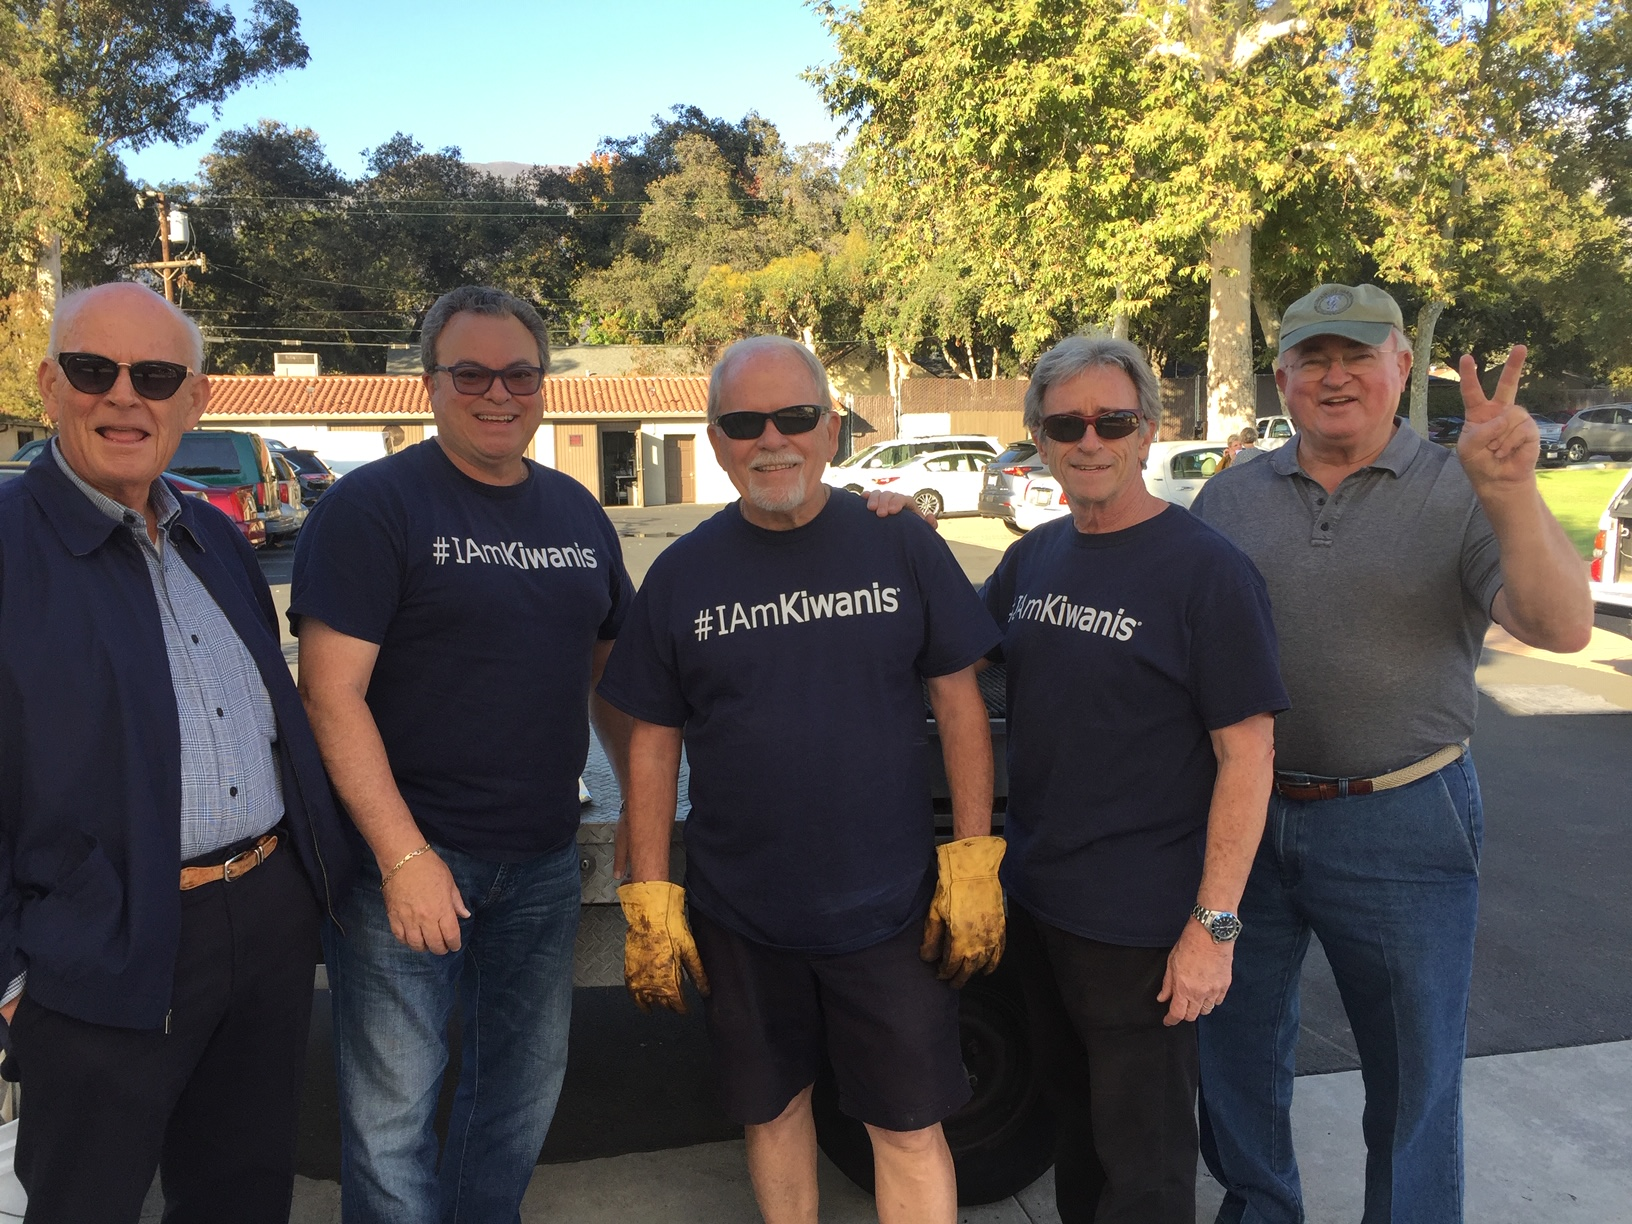 John Byer, Jose Sierra, Randy Slaughter, Lou Finkelberg and John Simpson- Kiwanis BBQ at Hathaway Sycamores